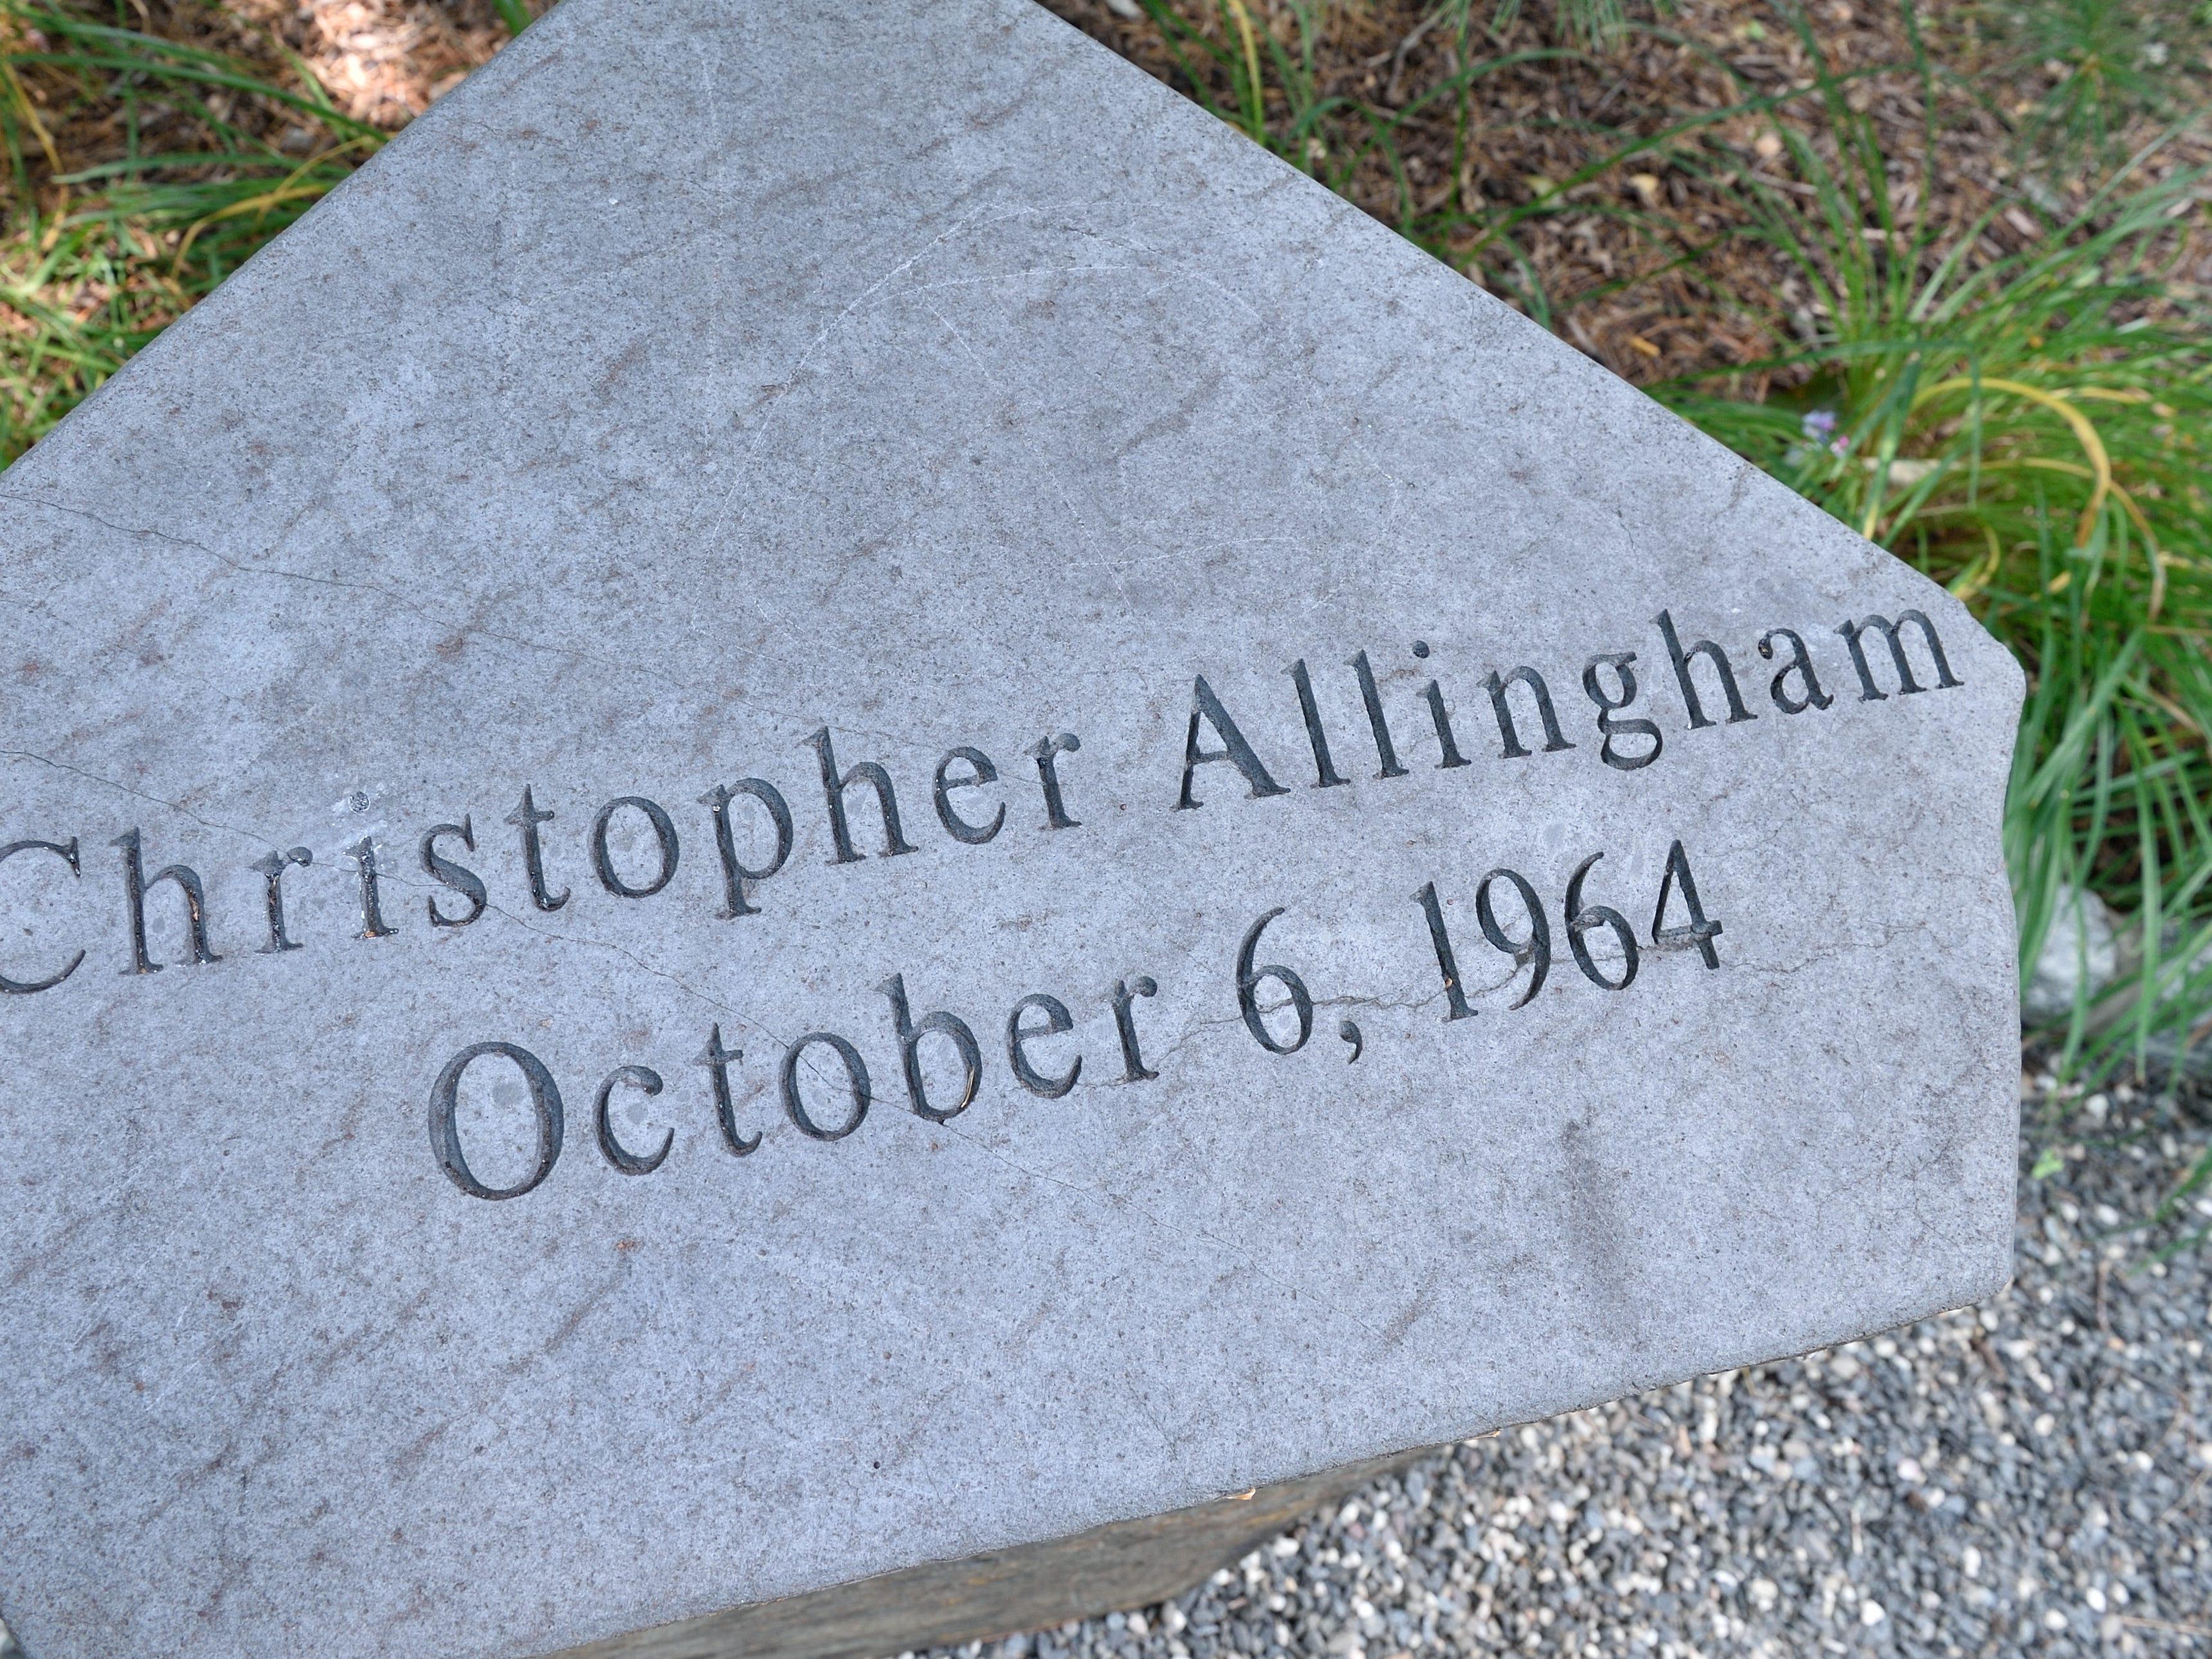 Christopher Allingham of River Edge. A monument honoring Allingham is shown at the River Edge 9/11 Memorial Gardens.